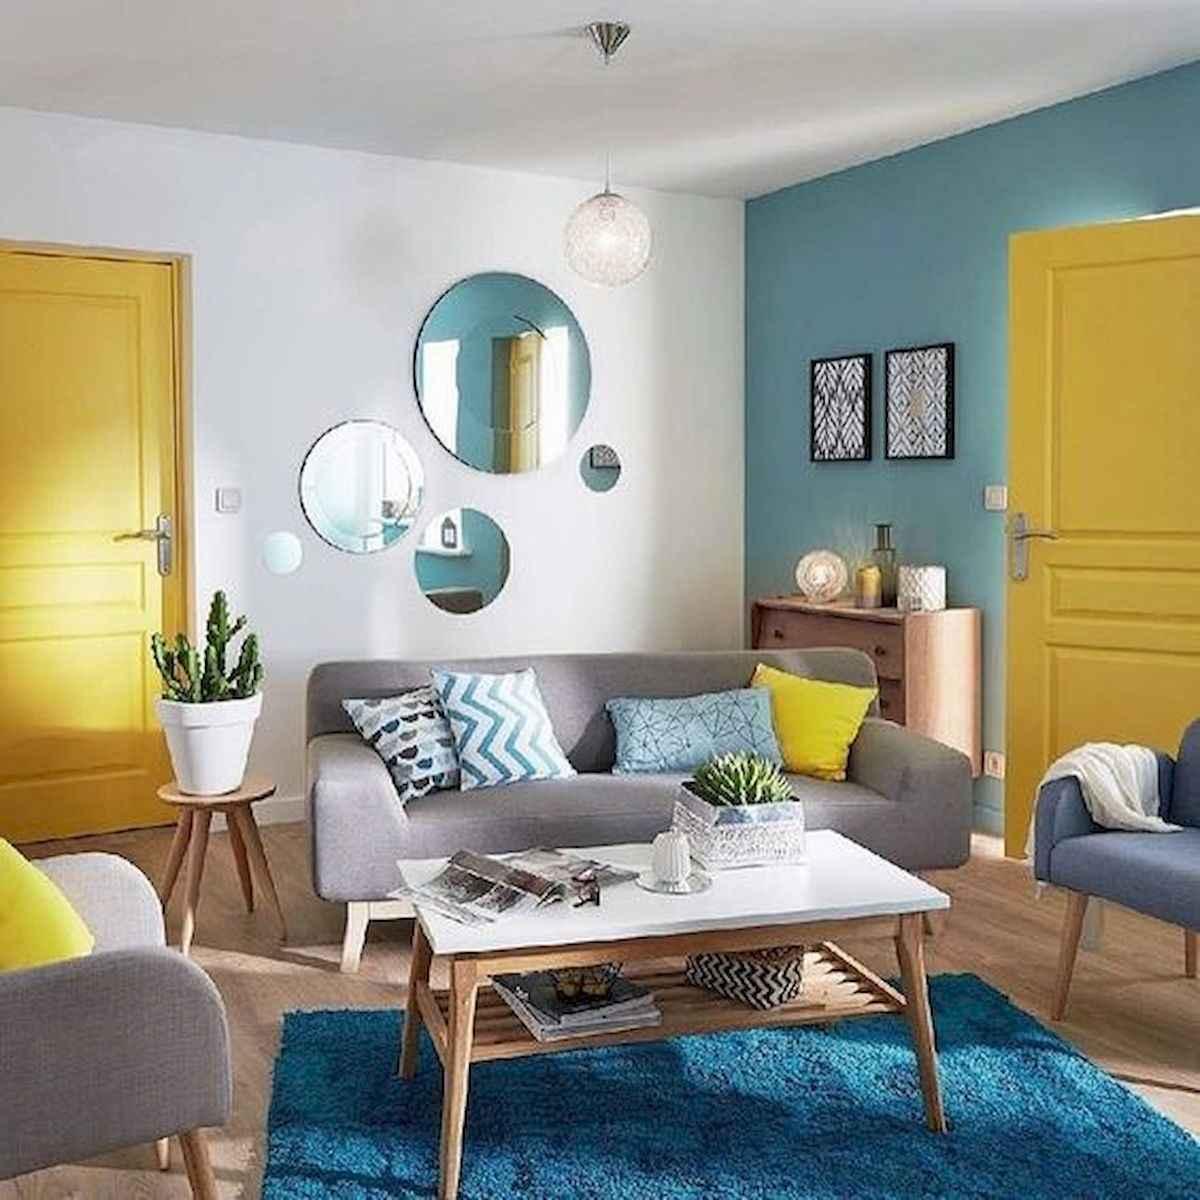 25 home decor ideas for modern living room (15)